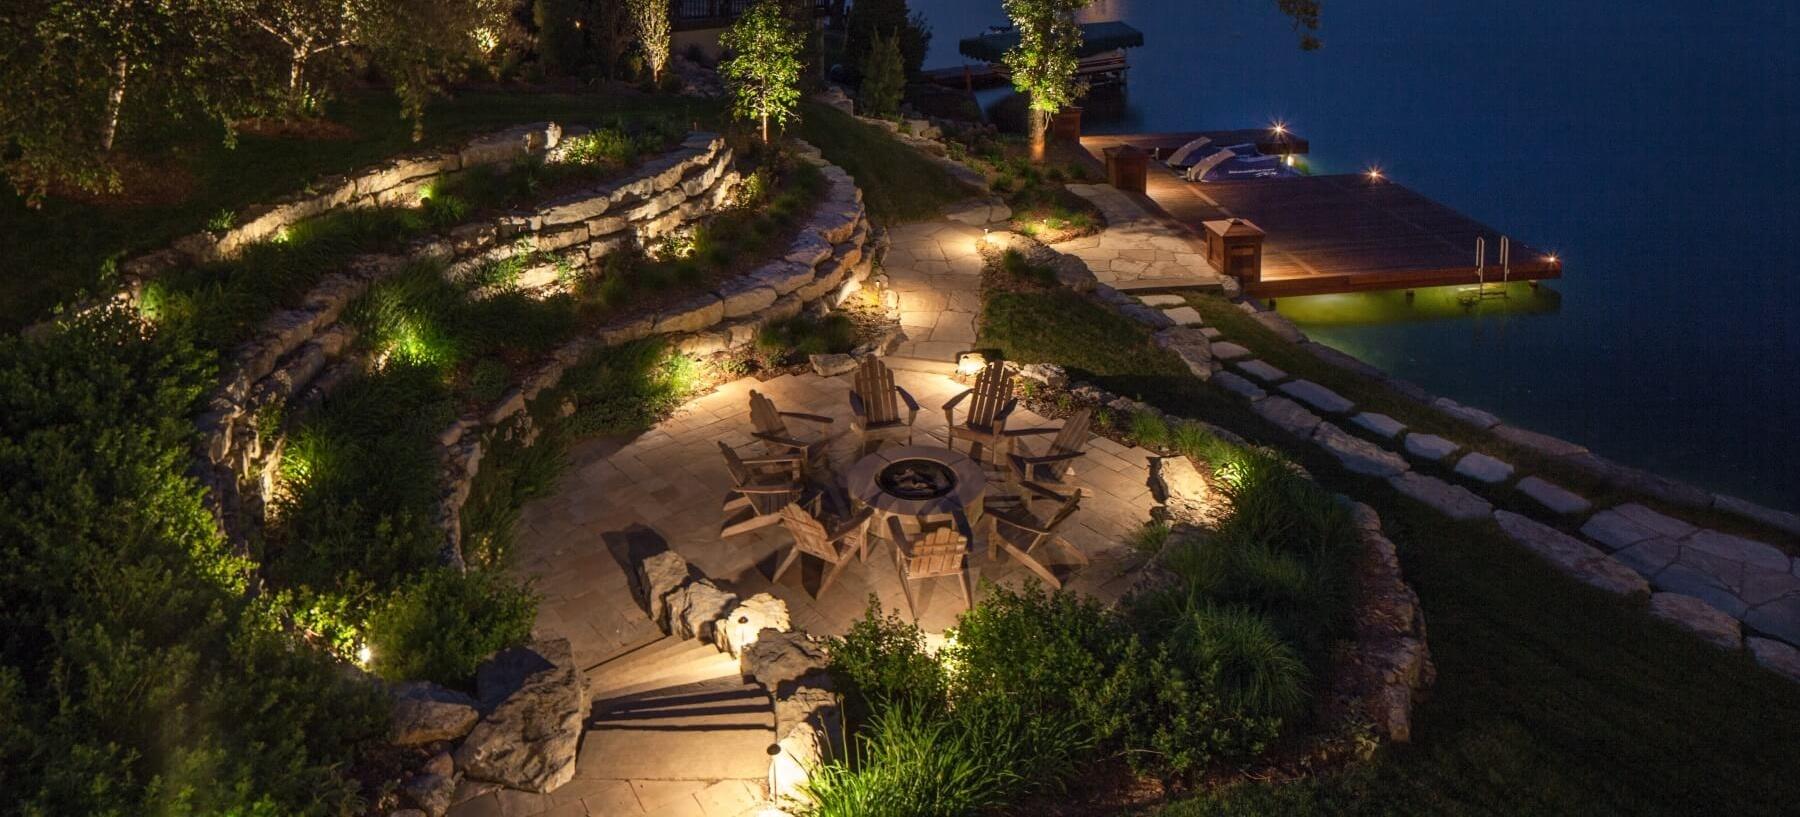 Vacation Home Landscape Lighting